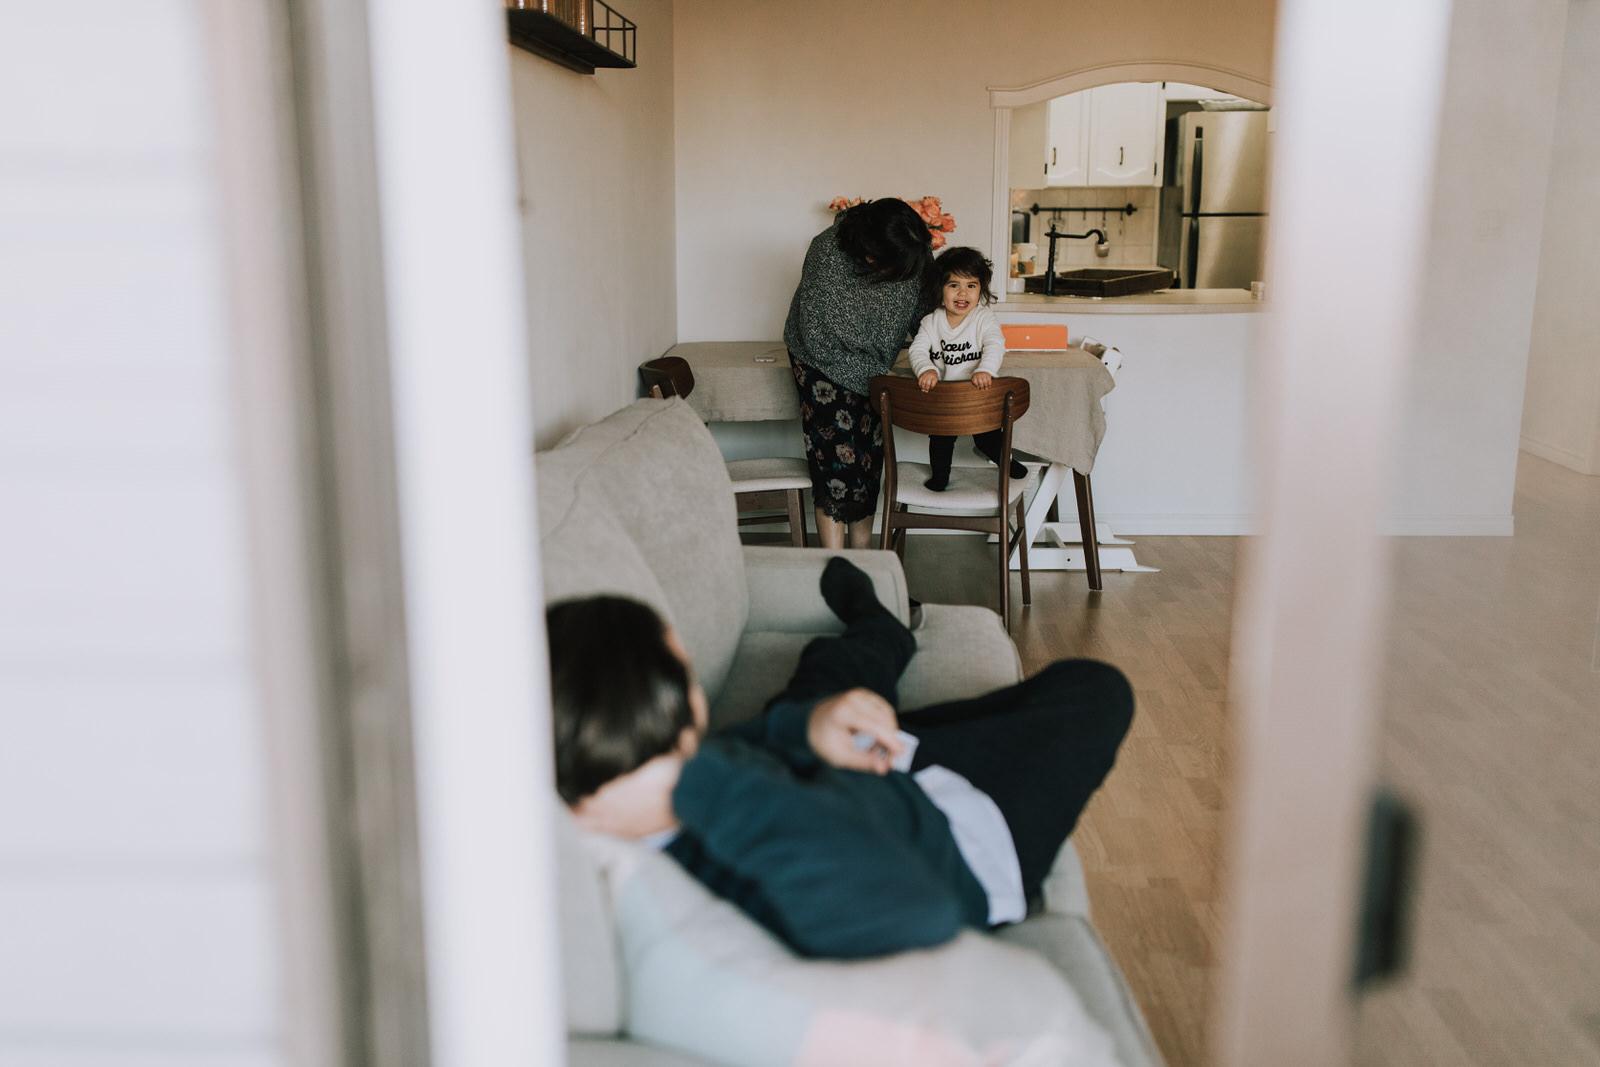 family-session-the-jupps-vancouver-photographer-iamjohnyoo-14.JPG